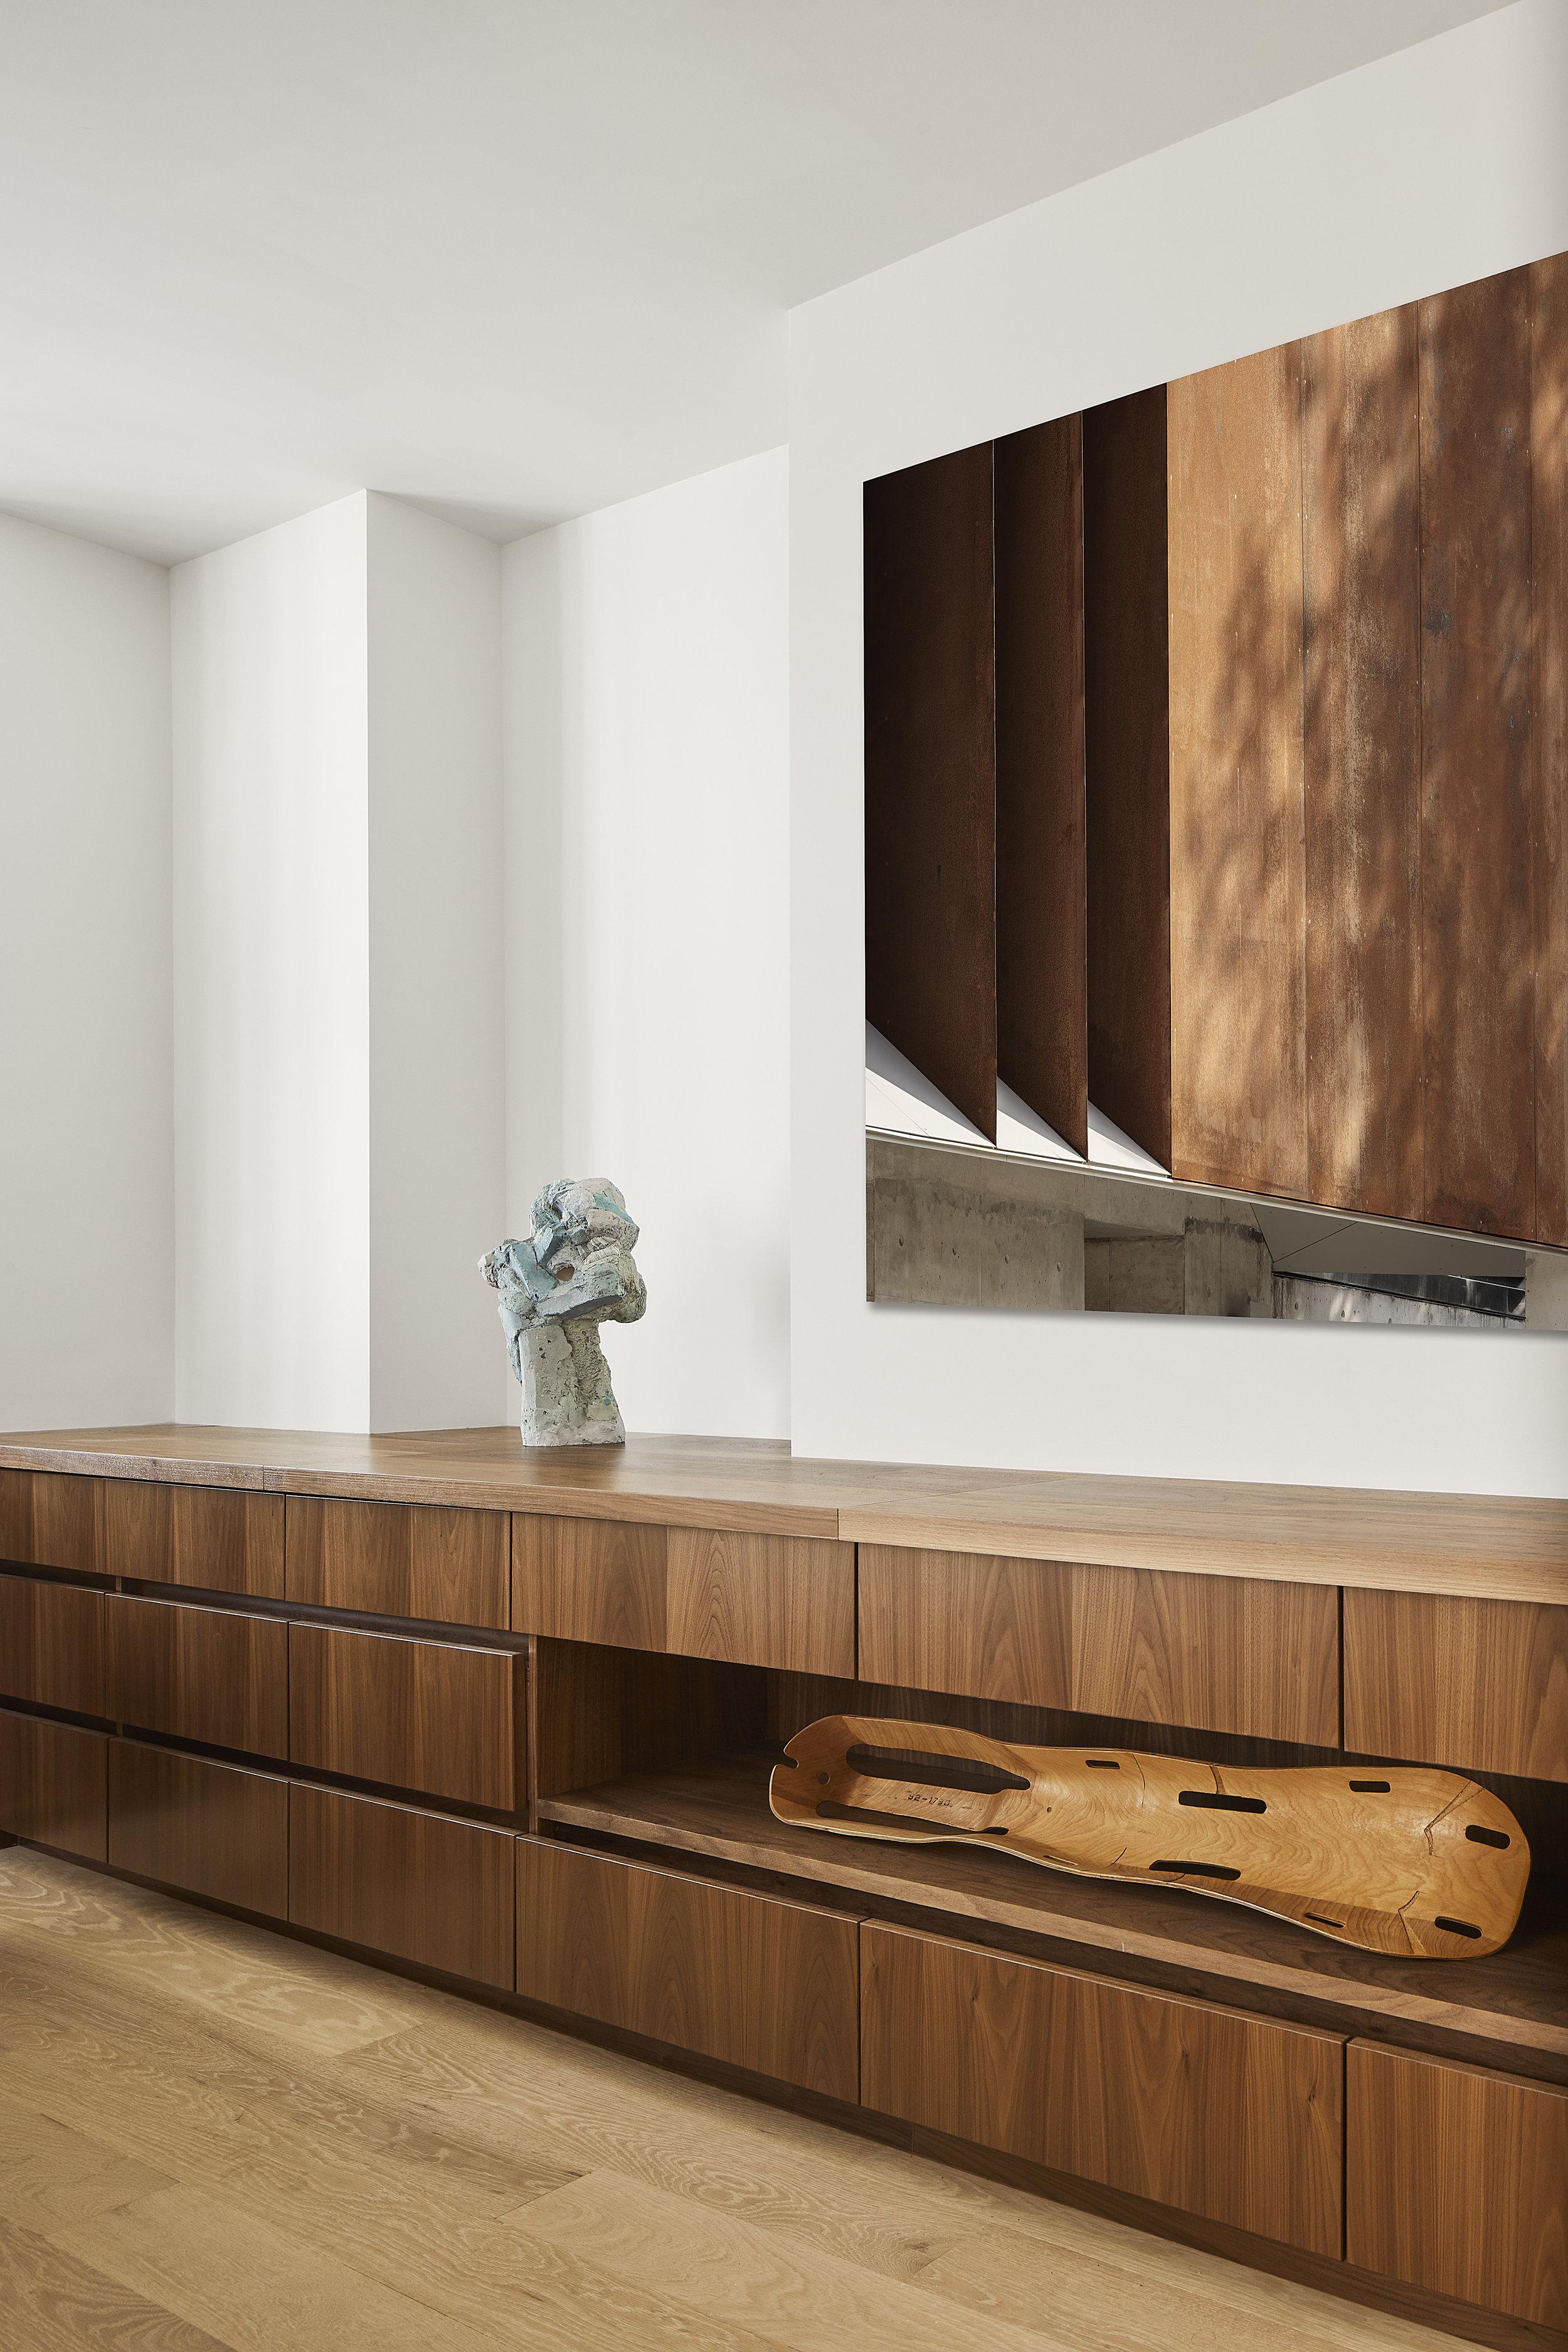 turkel_design_modern_prefab_home_soho_loft_cabinetry_storage.jpg